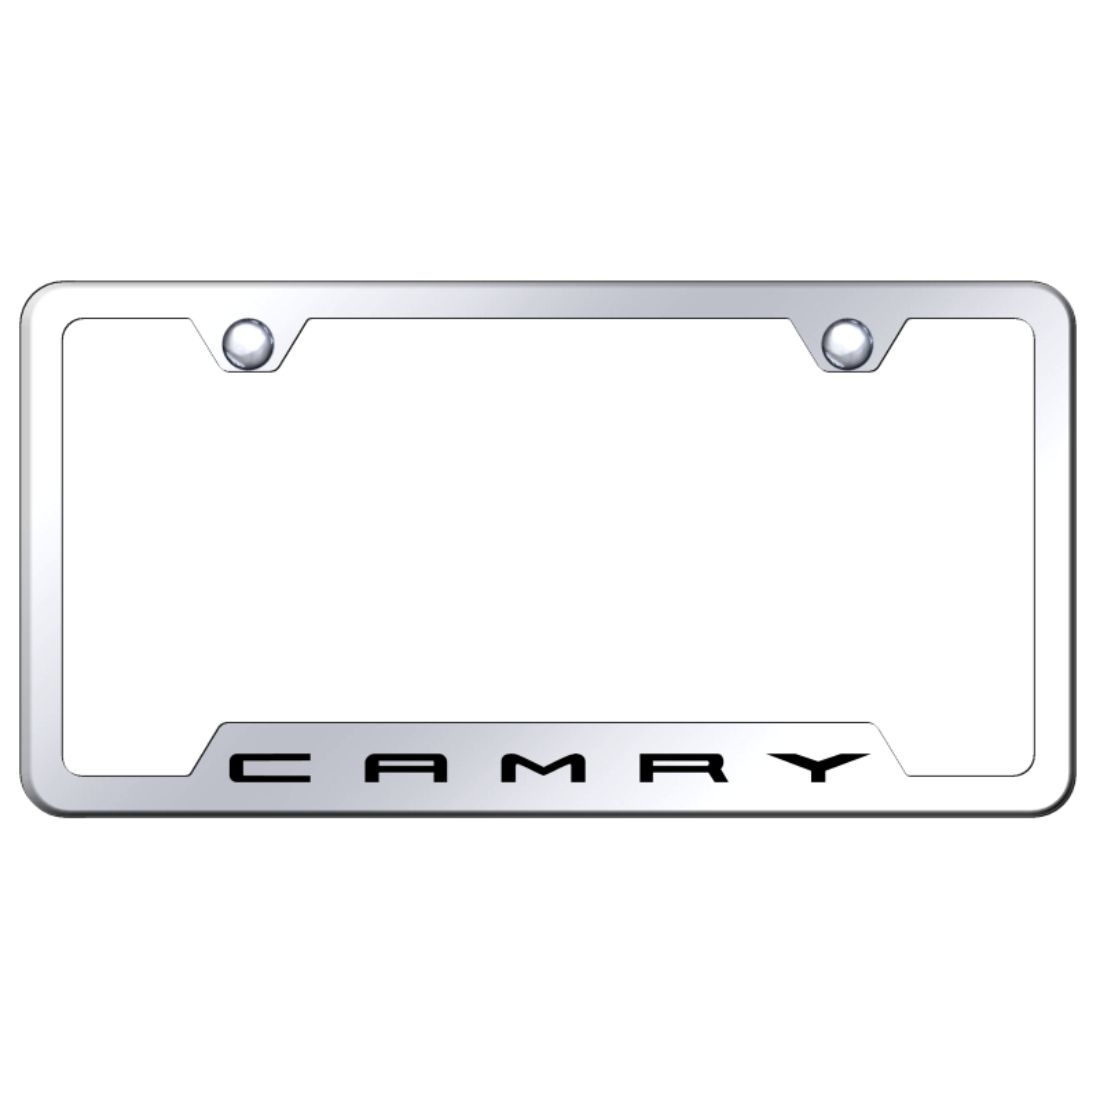 Toyota Camry Chrome Metal License Plate Frame